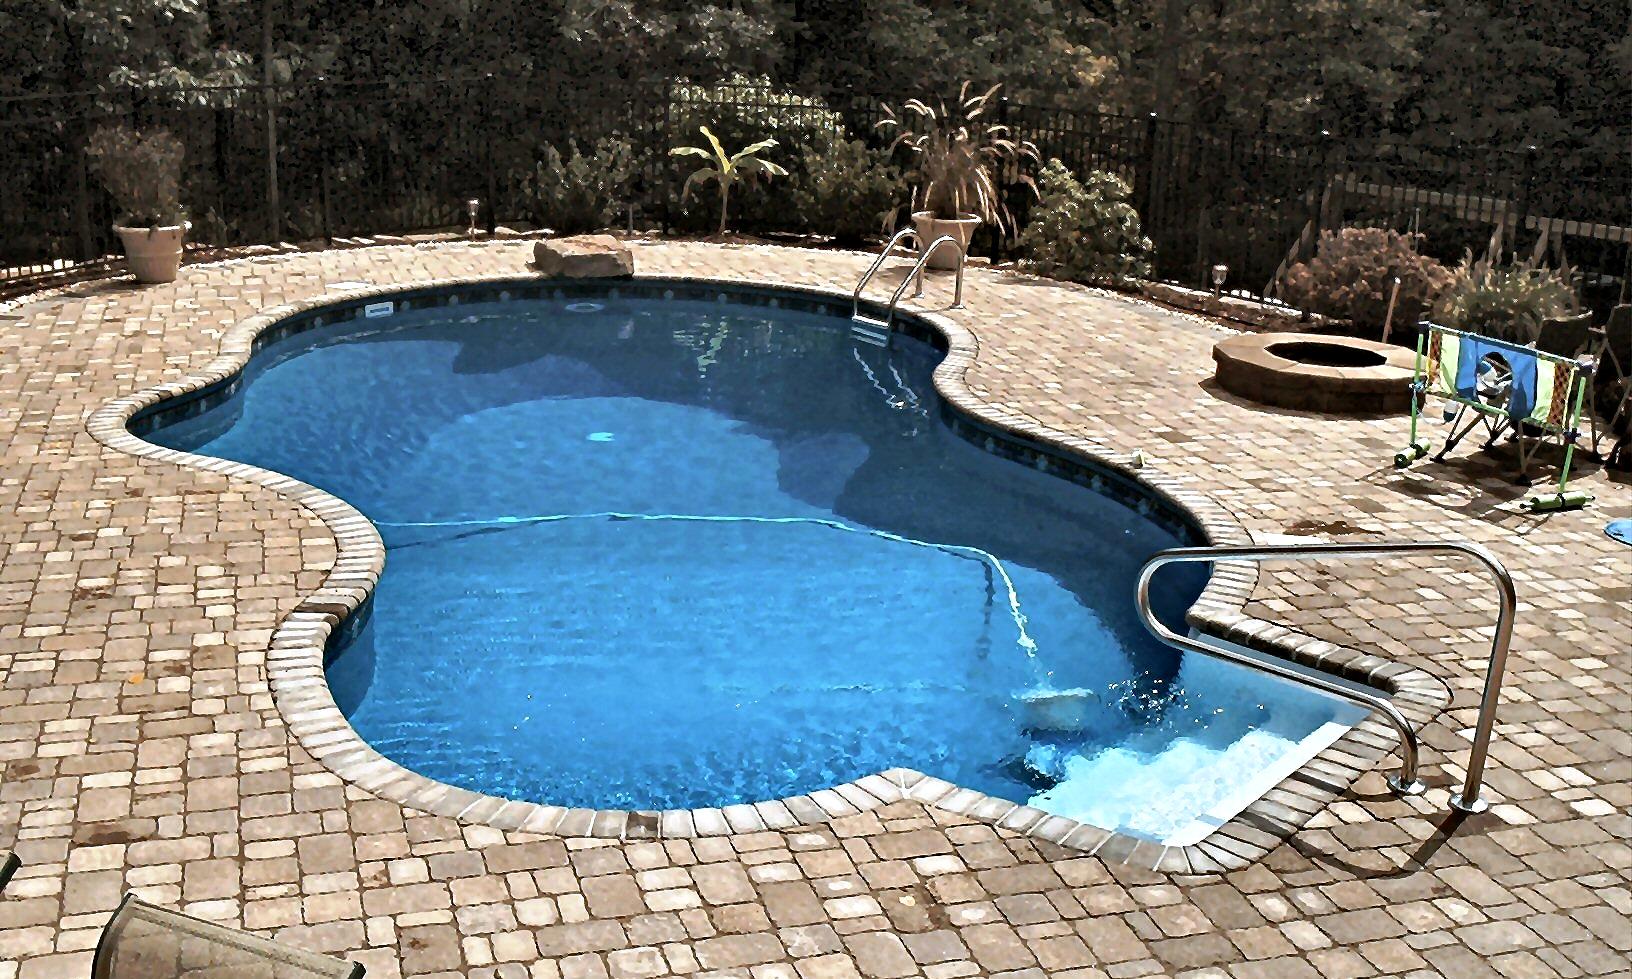 Lapszynski pool